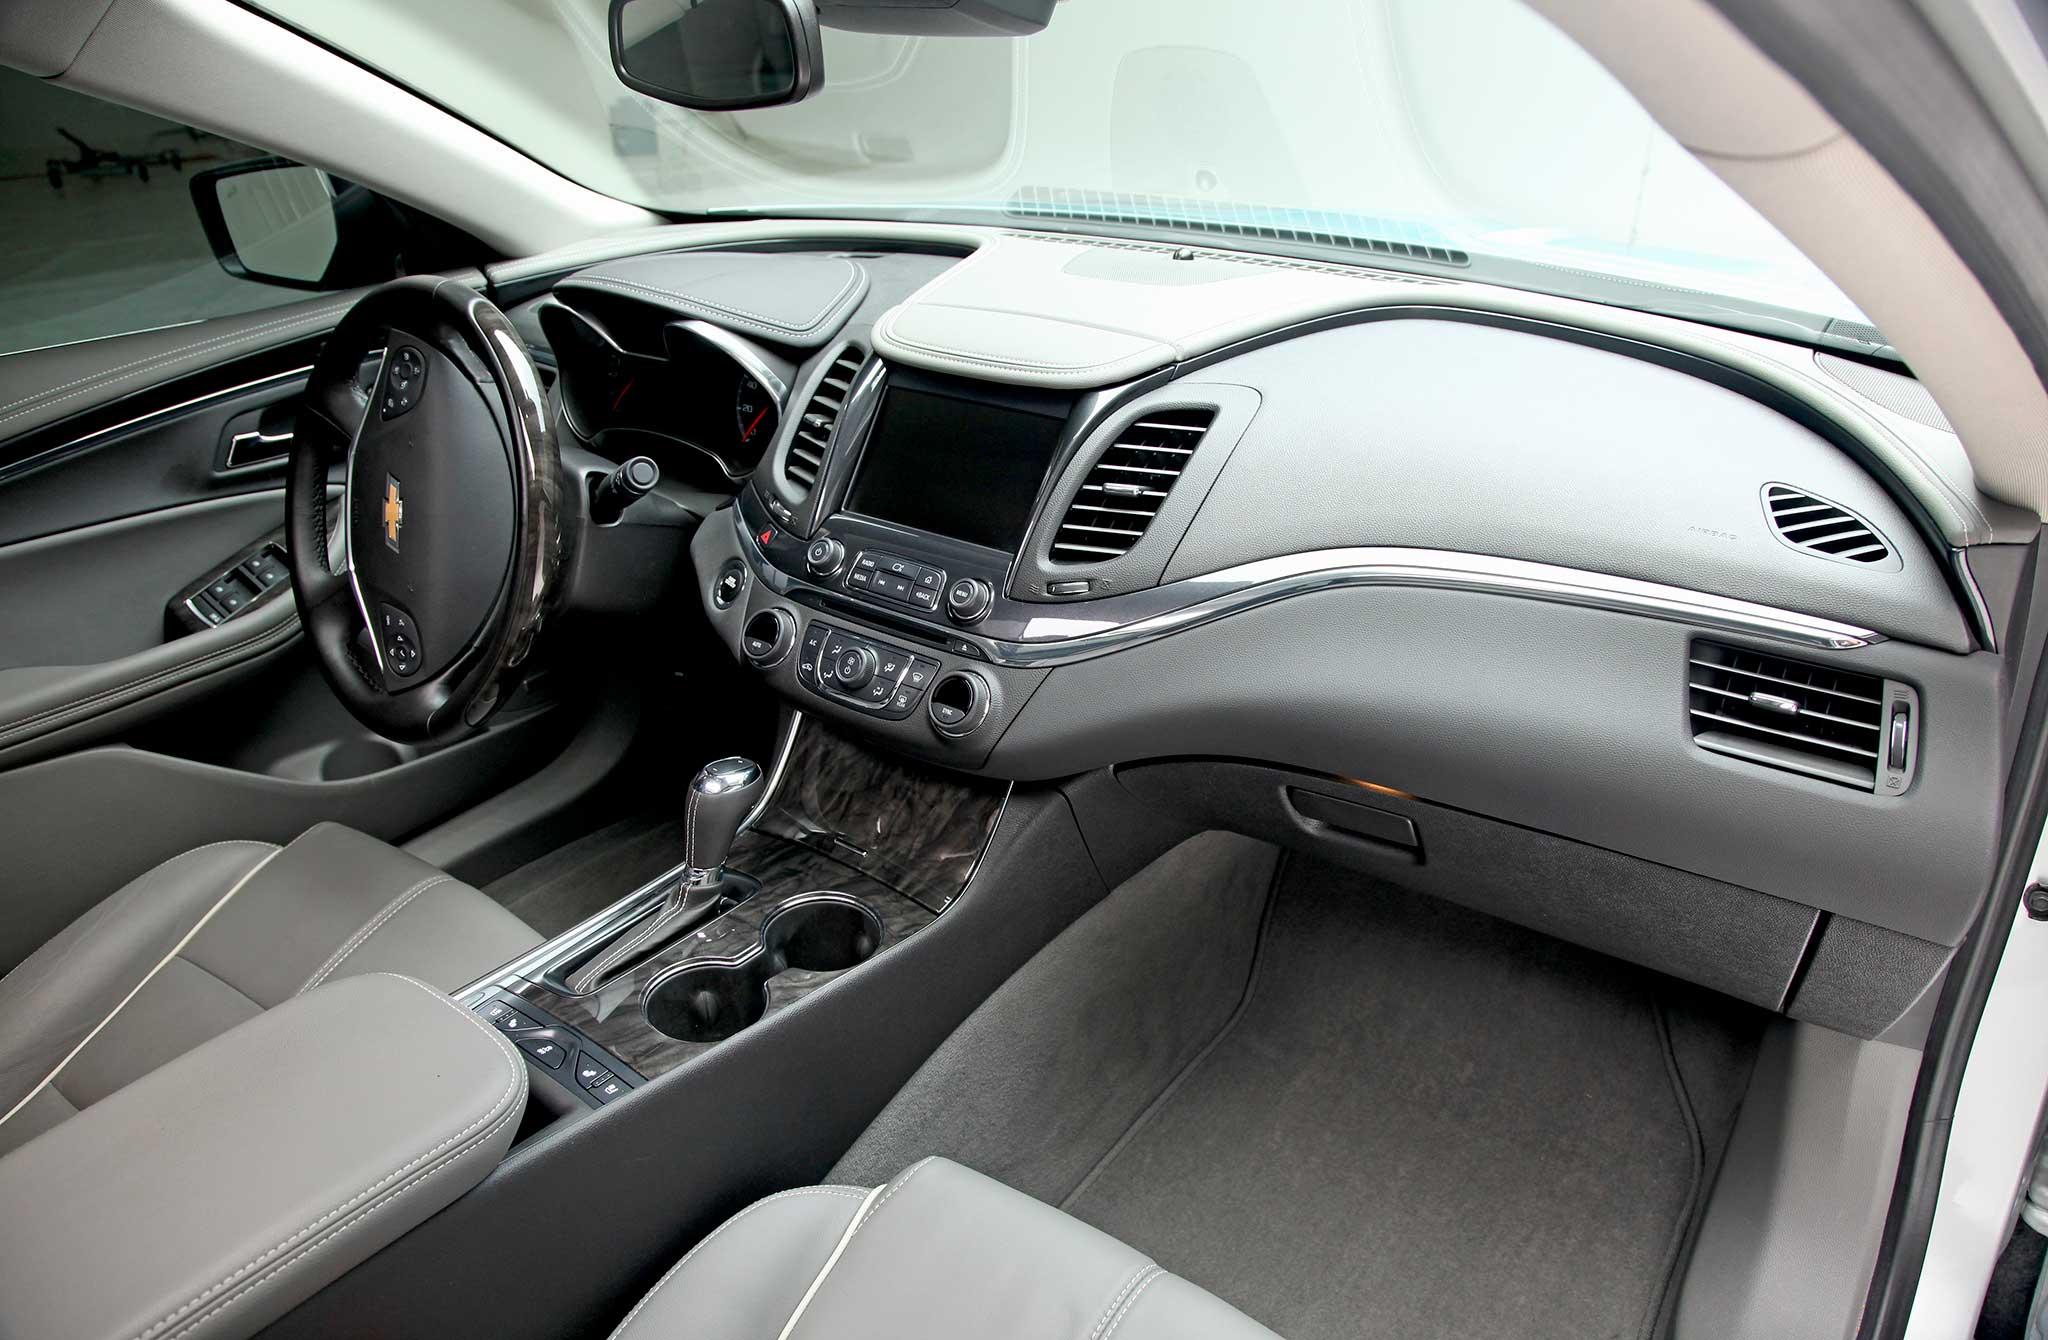 2014 chevrolet impala generation x lowrider 731 voltagebd Image collections